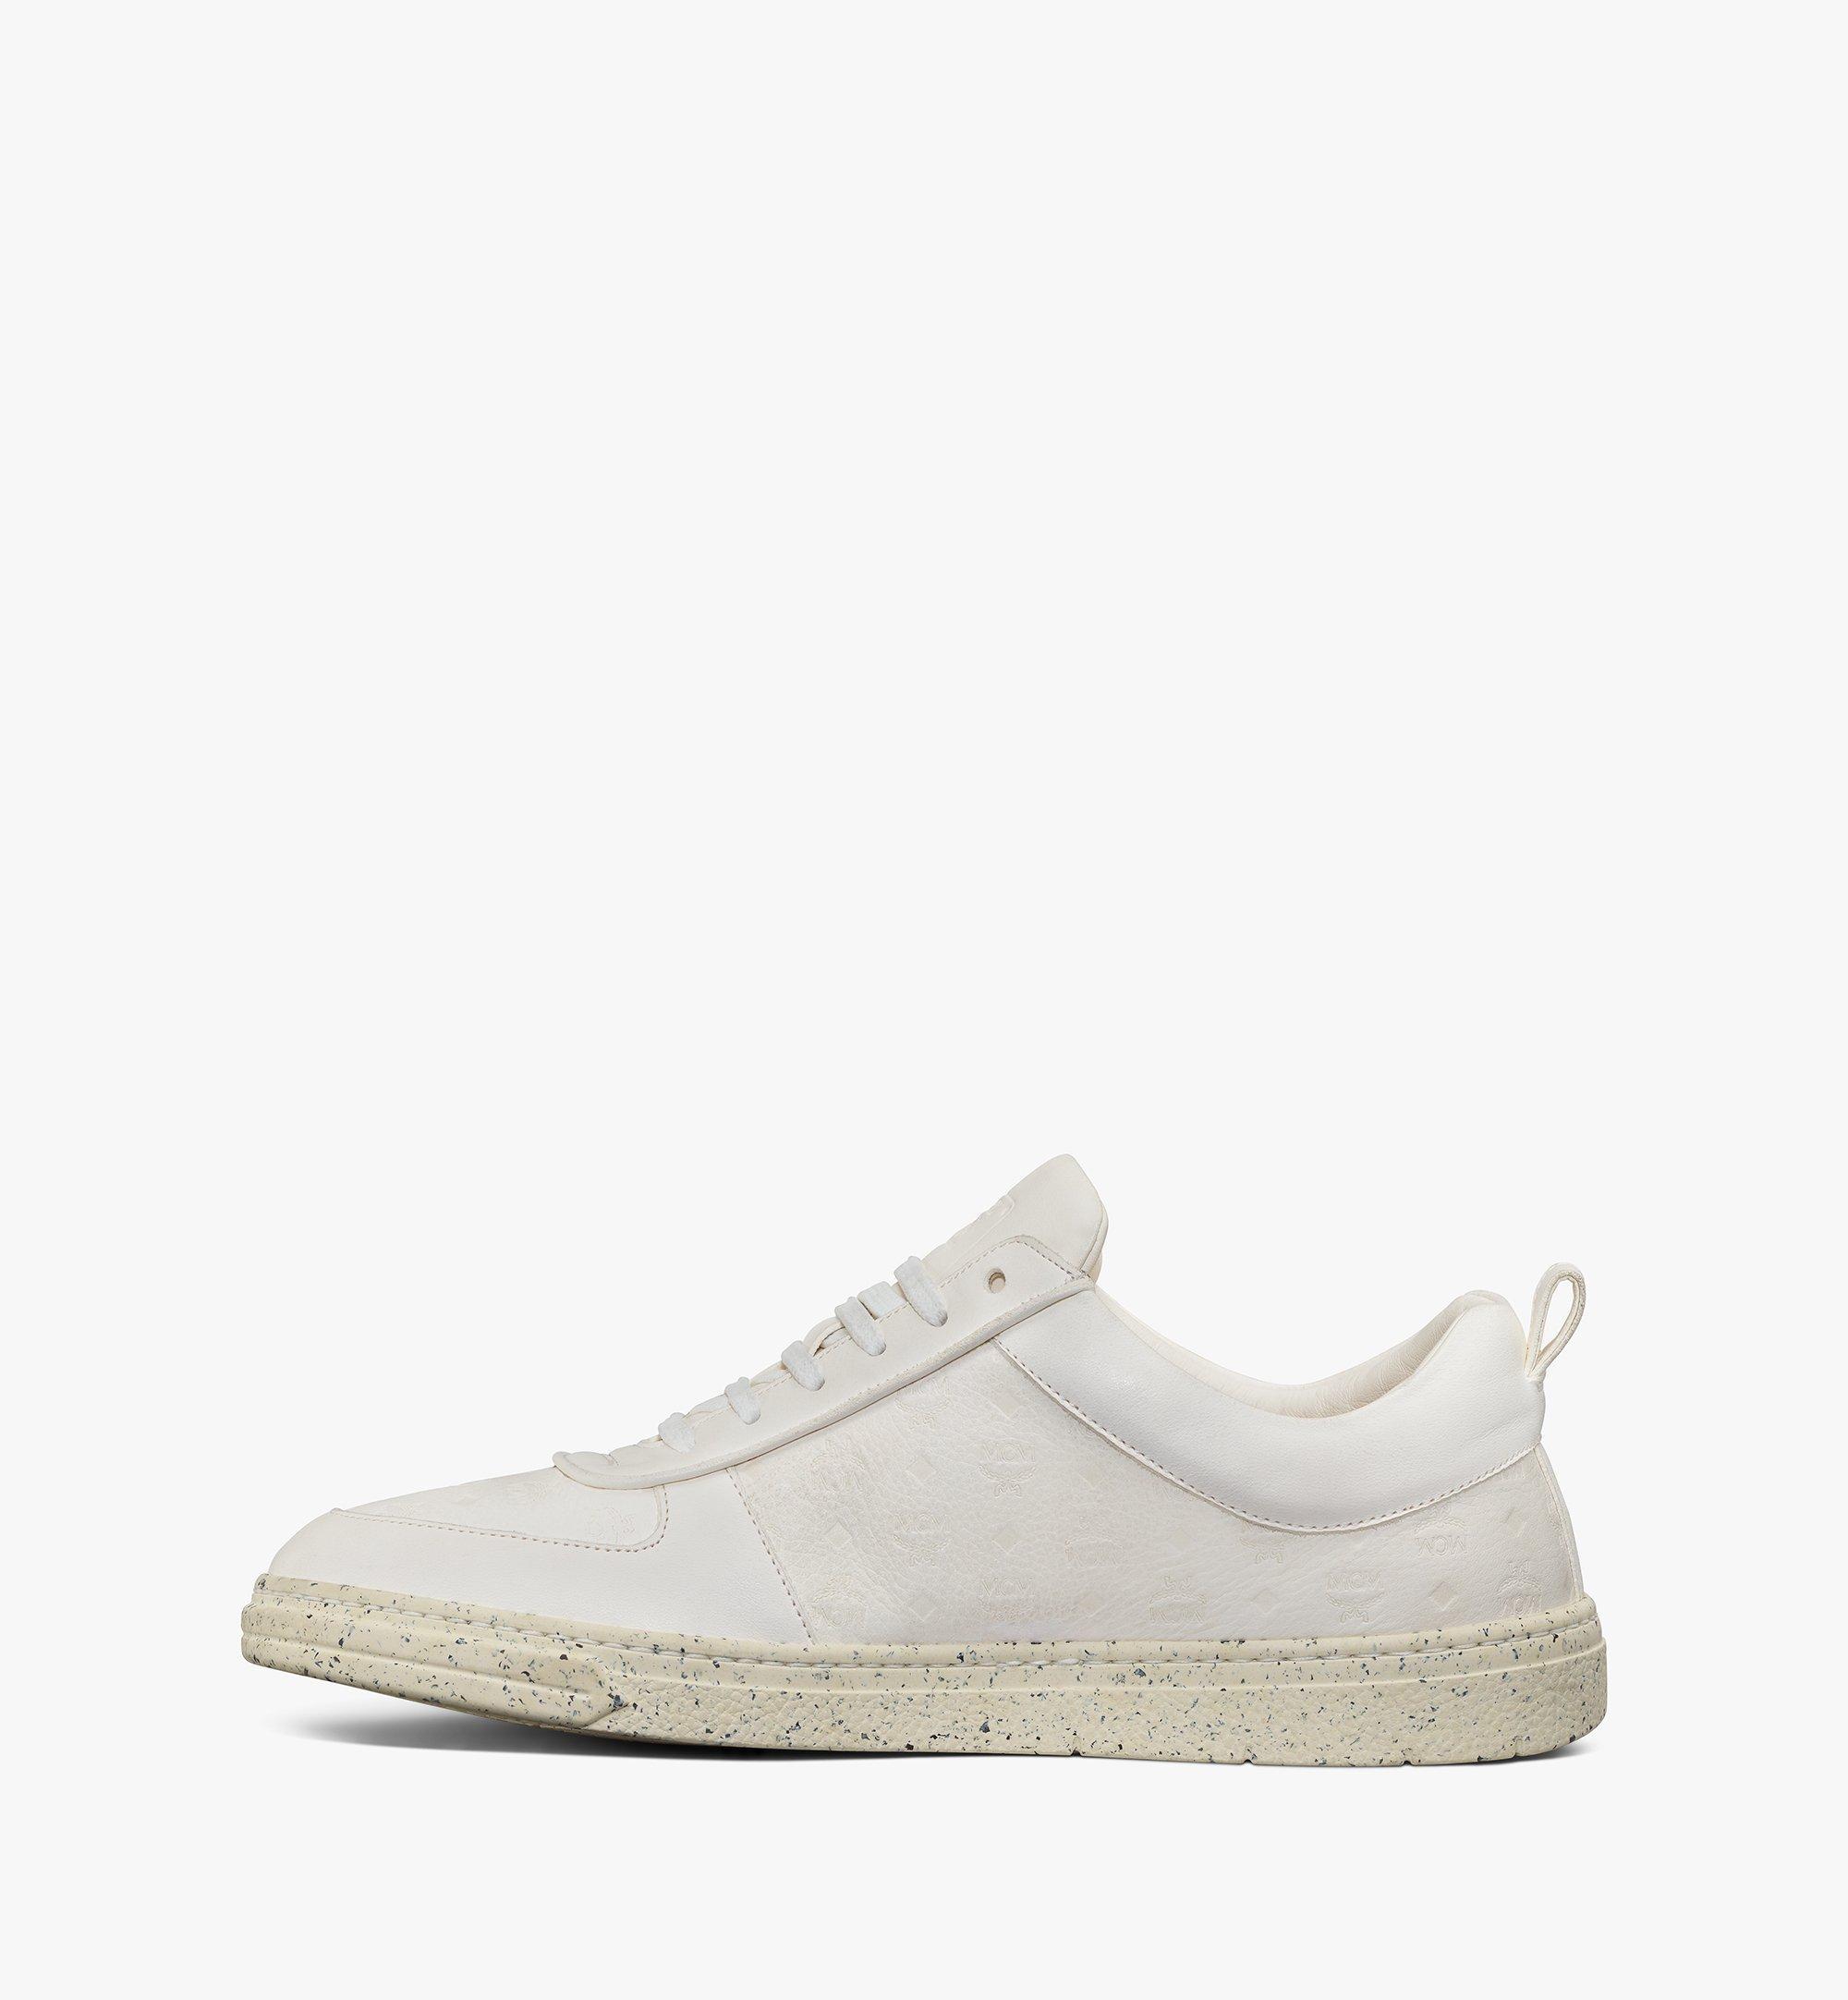 MCM Men's Sustainable Terrain Lo Sneakers White MEXAAMM14WT041 Alternate View 2